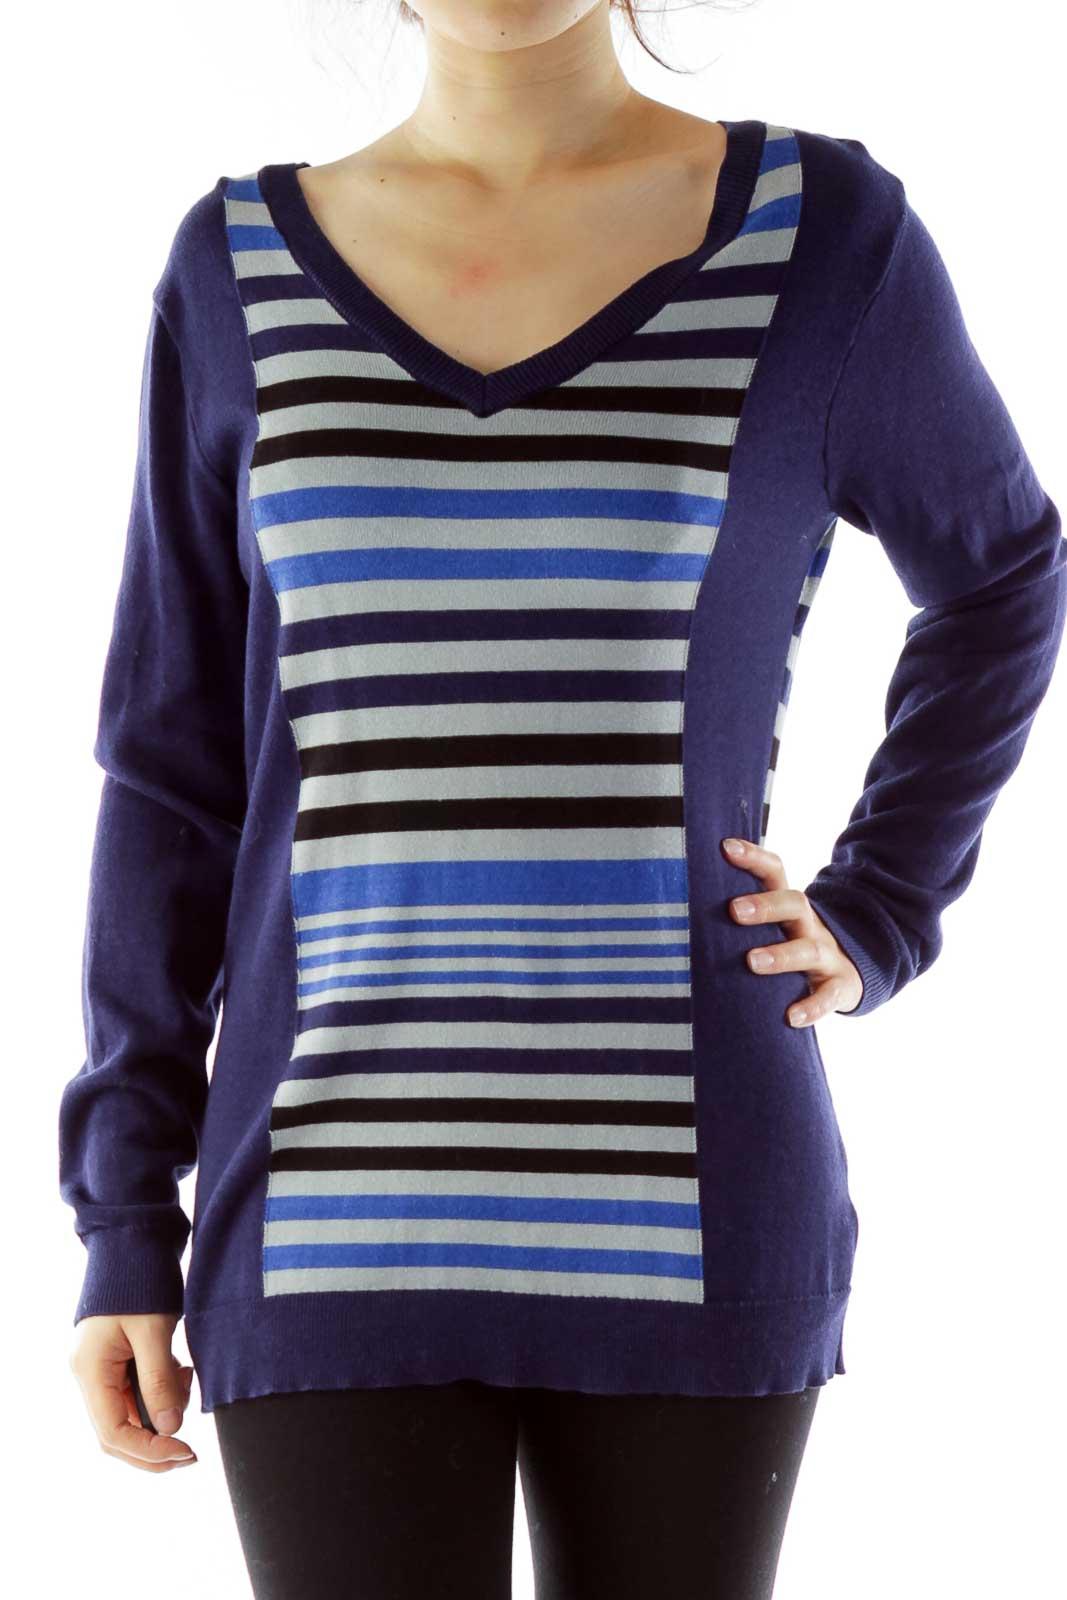 Navy Gray Striped V-Neck Knit Top Front